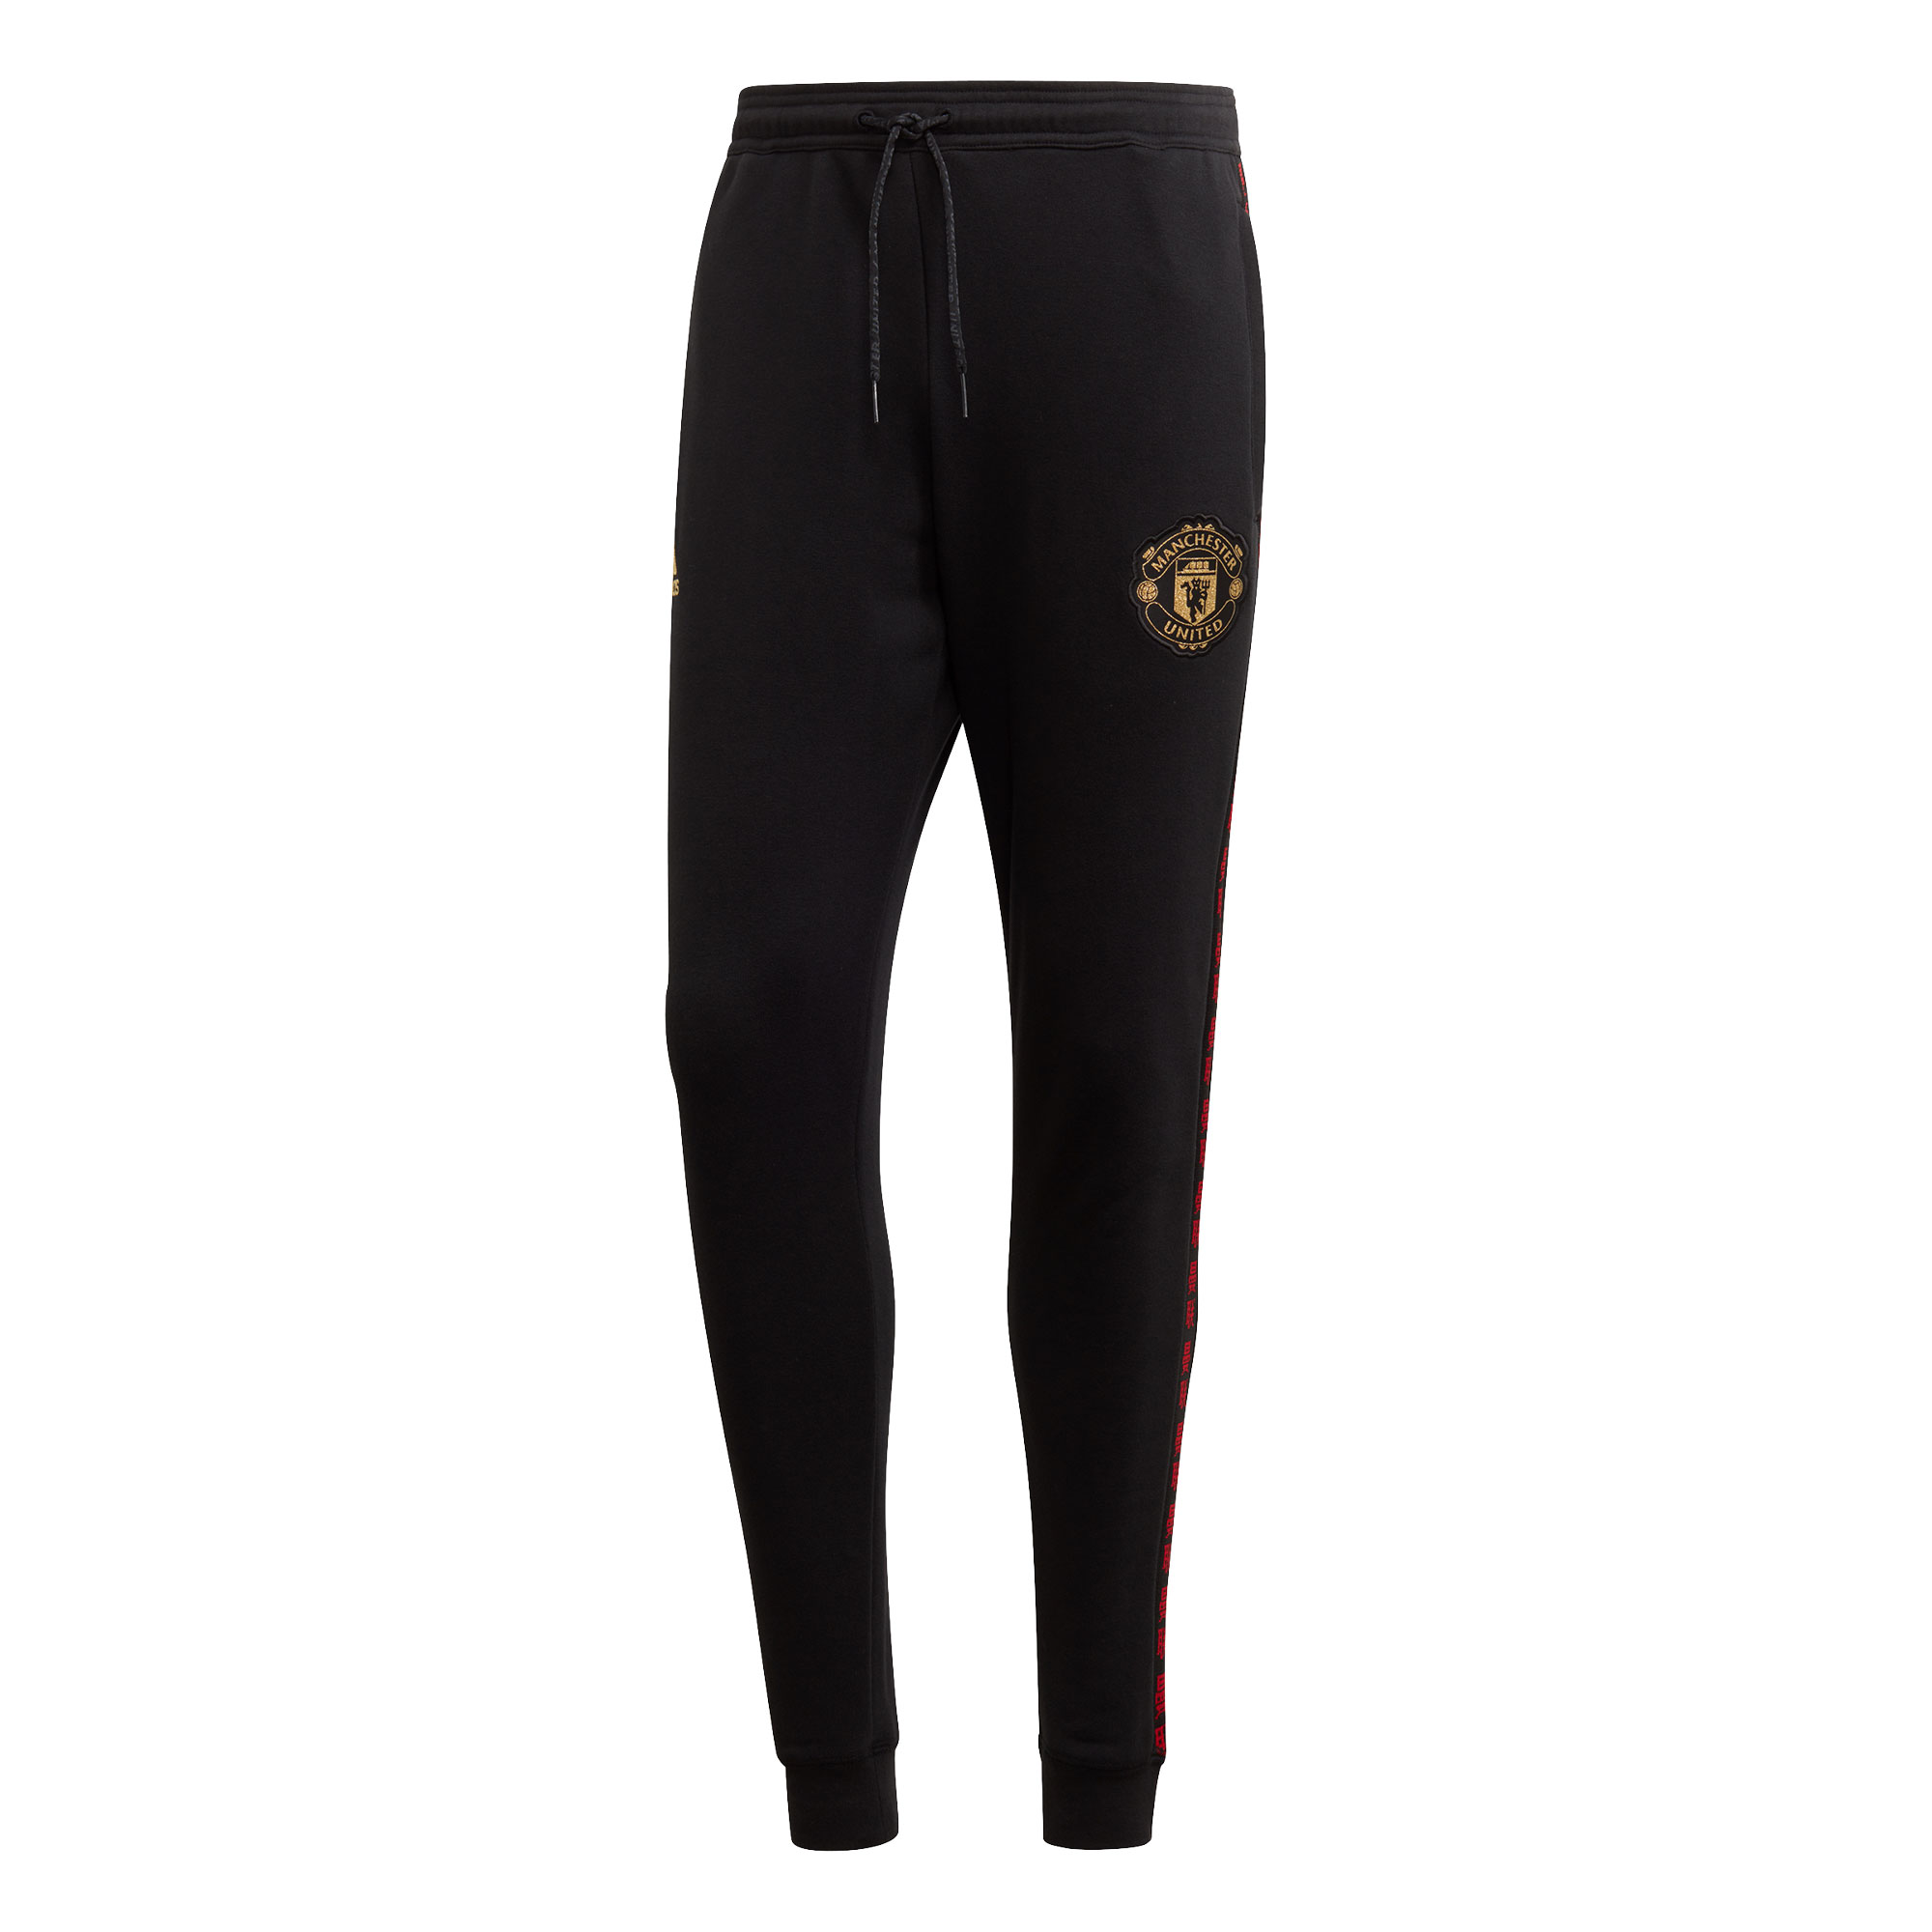 Pantalón de chándal del Manchester United en negro